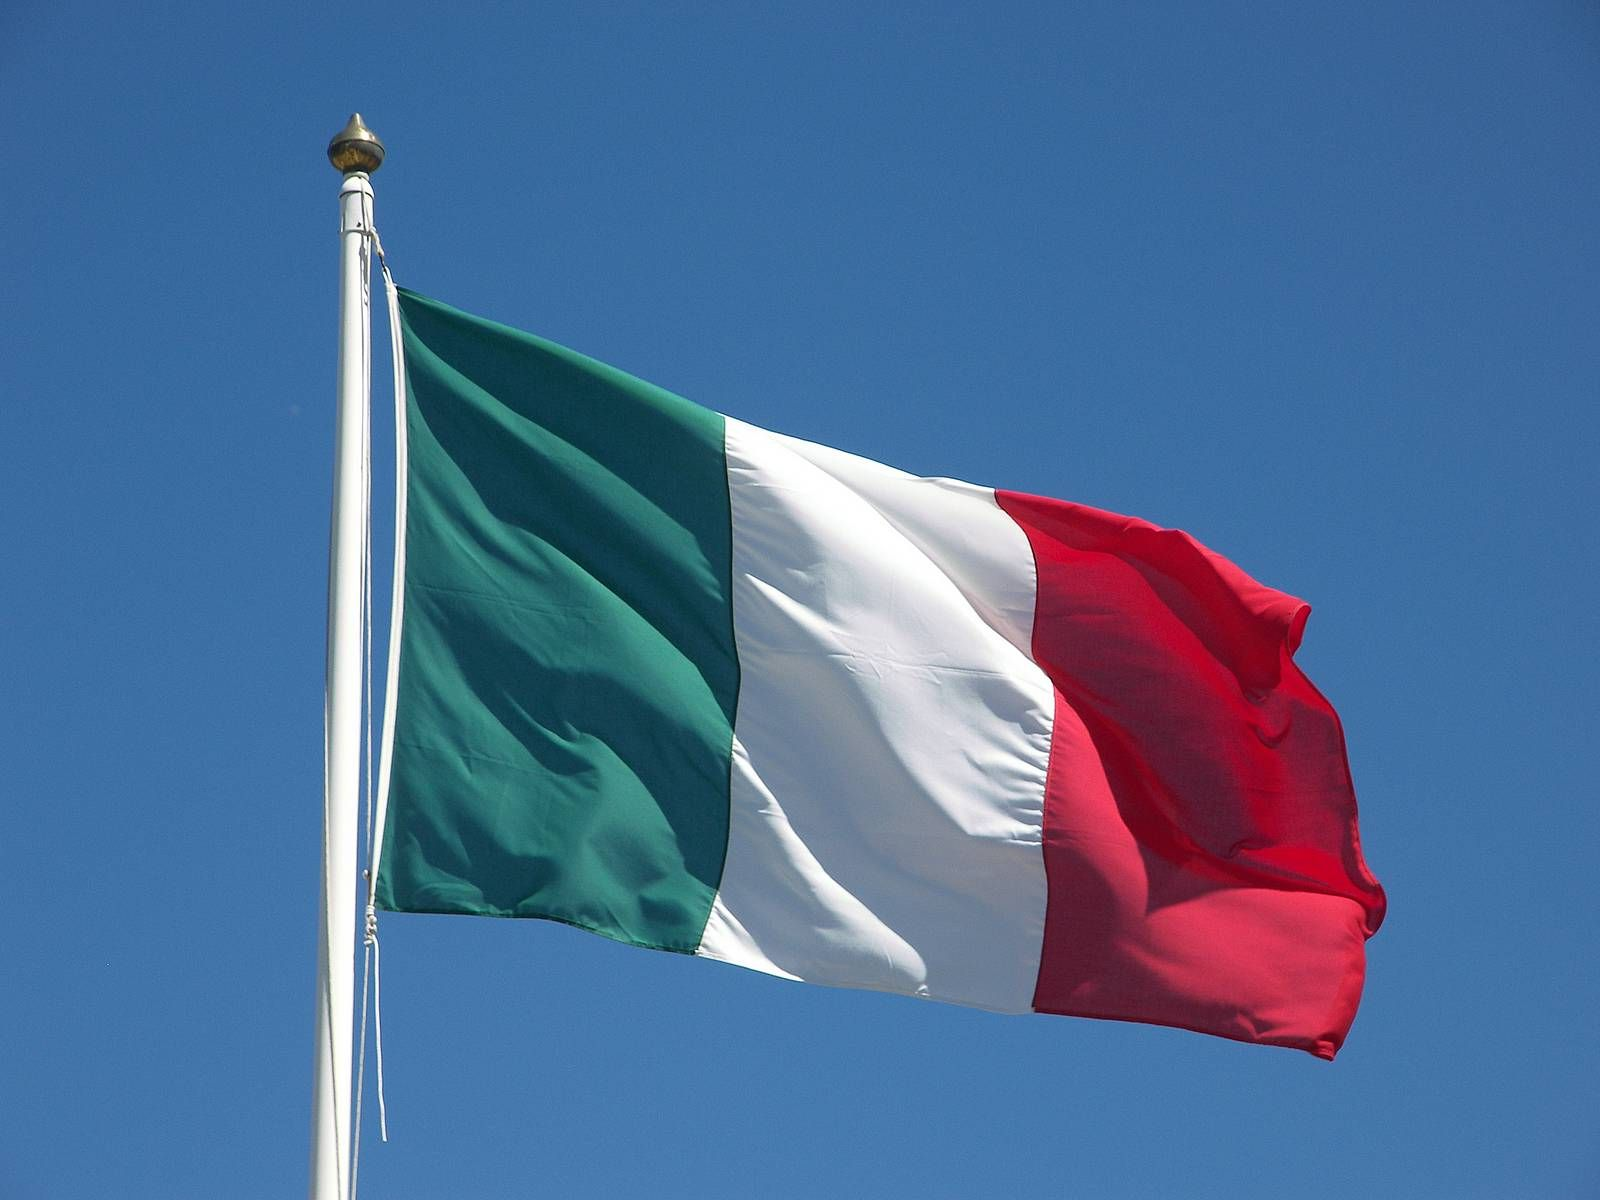 bandiera italiana - photo #46